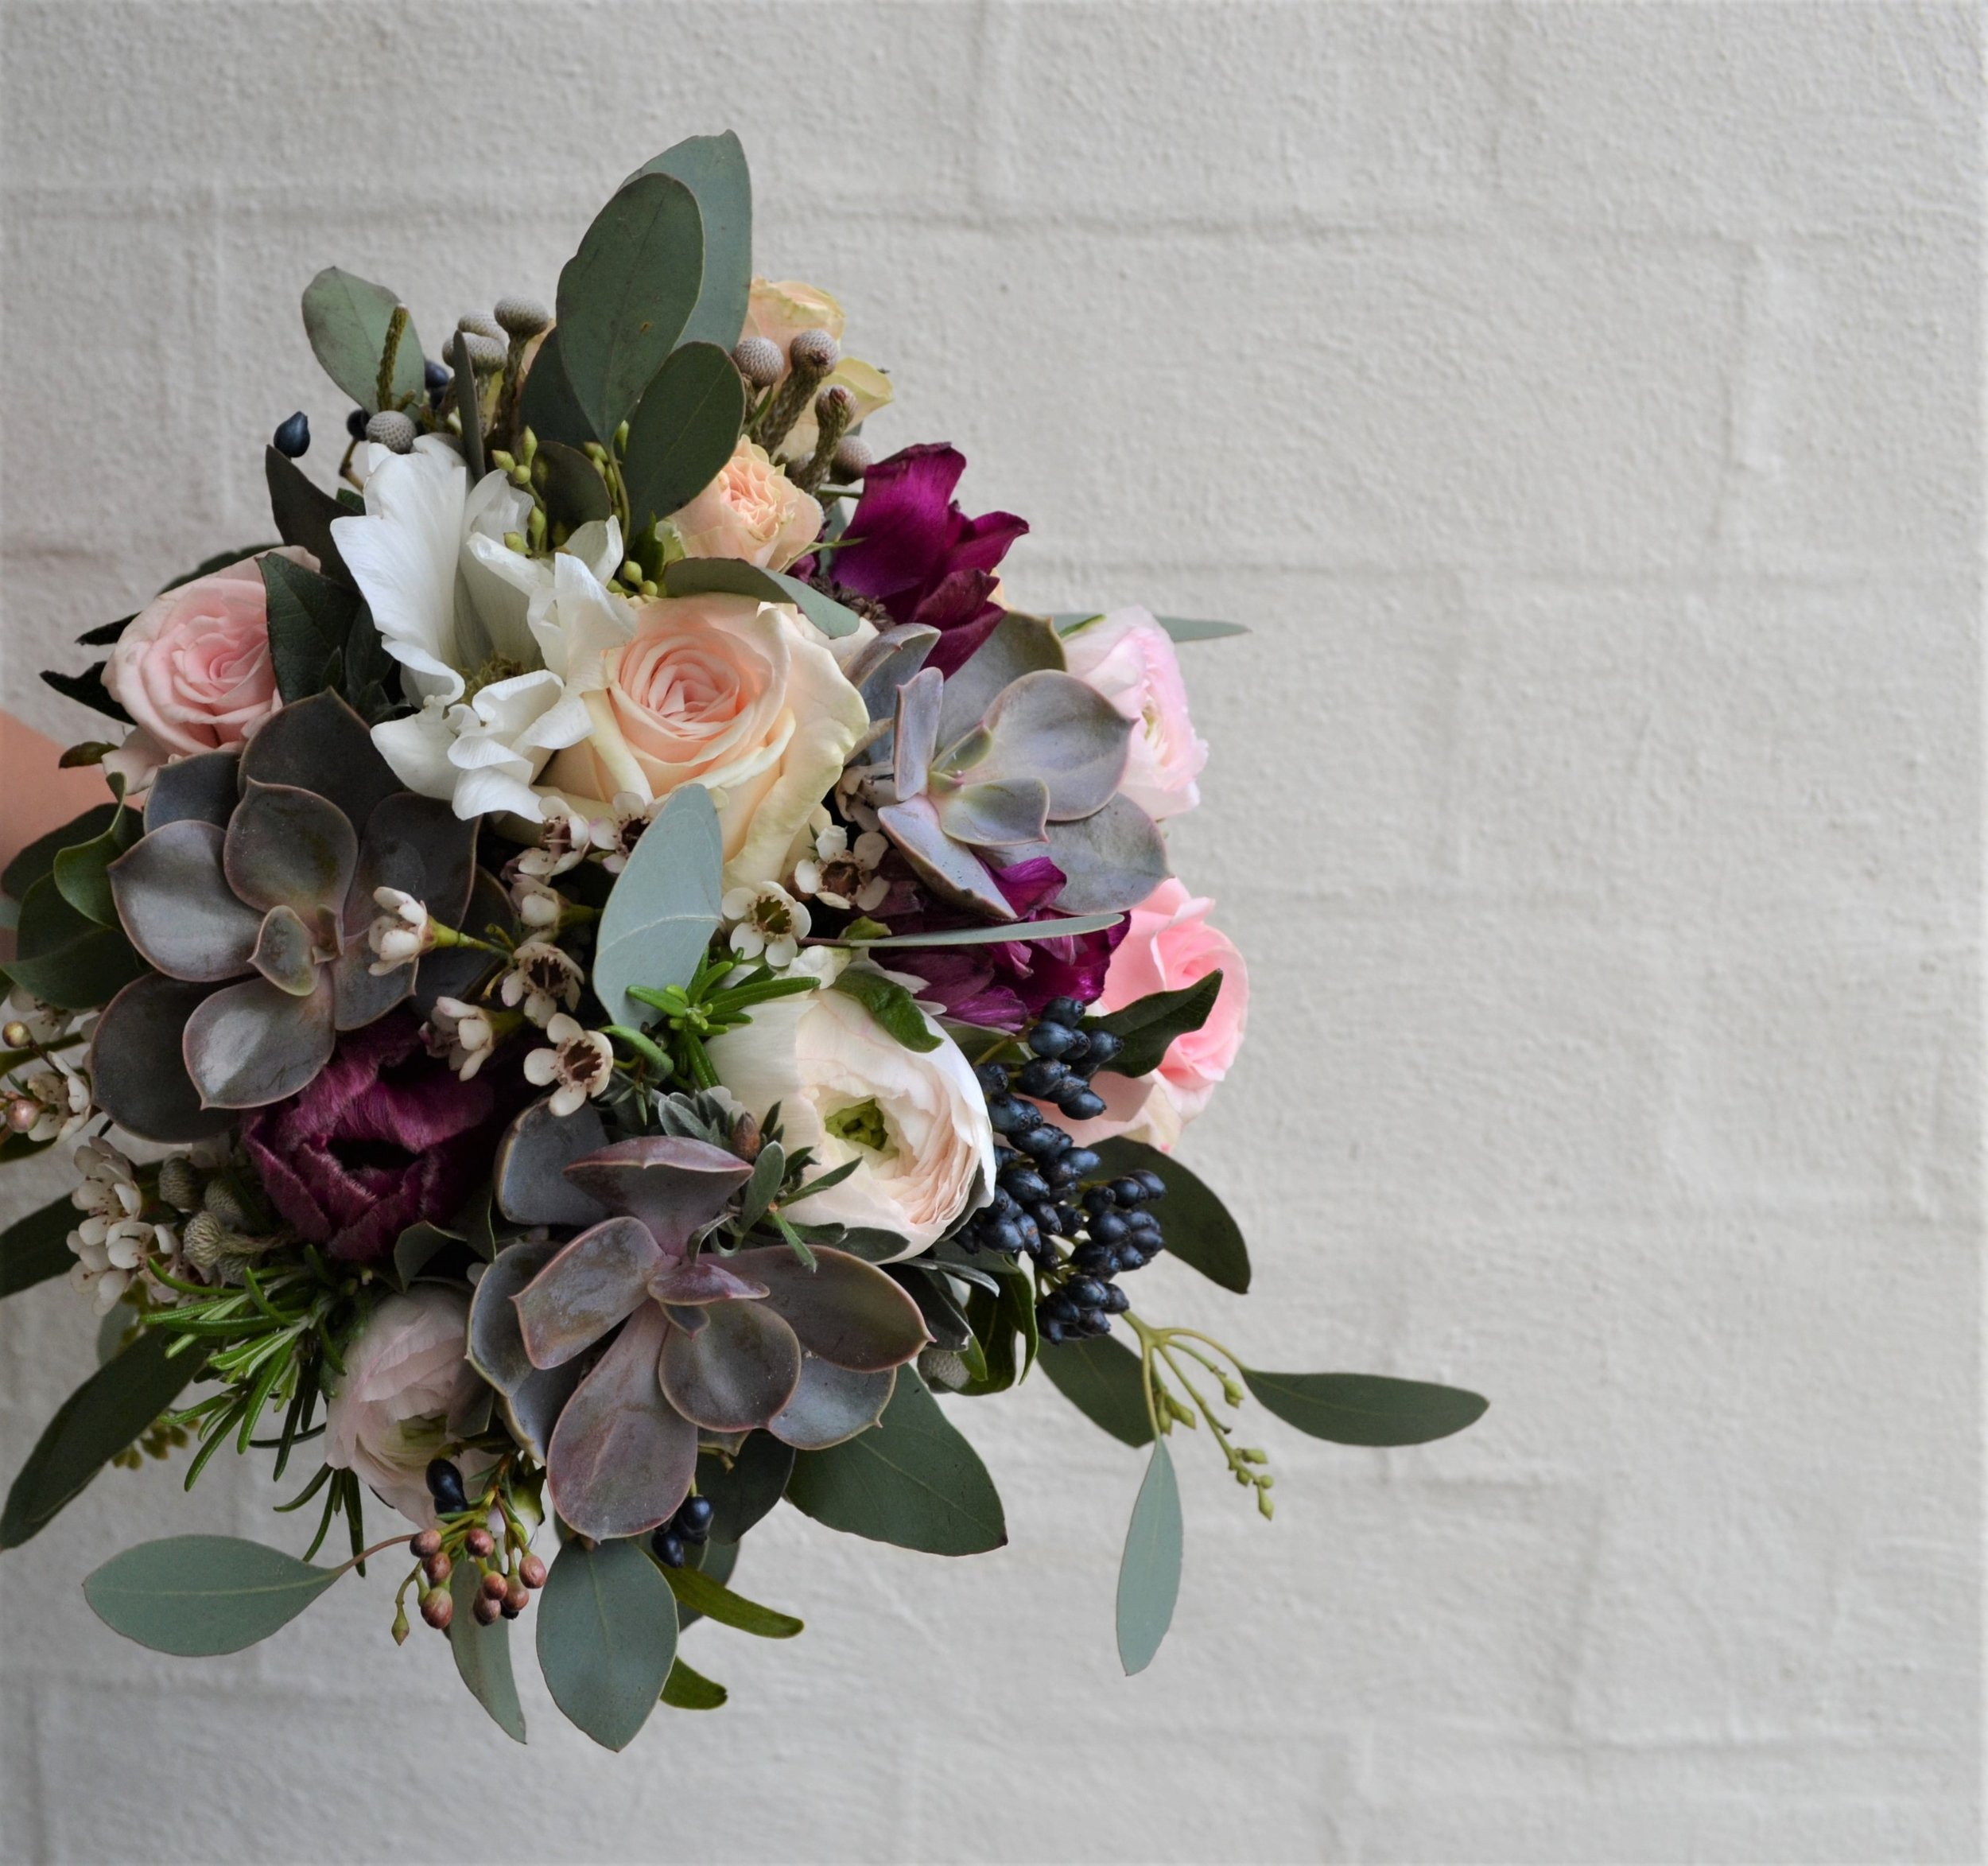 Brighton-Florist-Webb-Farrer-Bridal-Bouquet-Eucalyptus.JPG